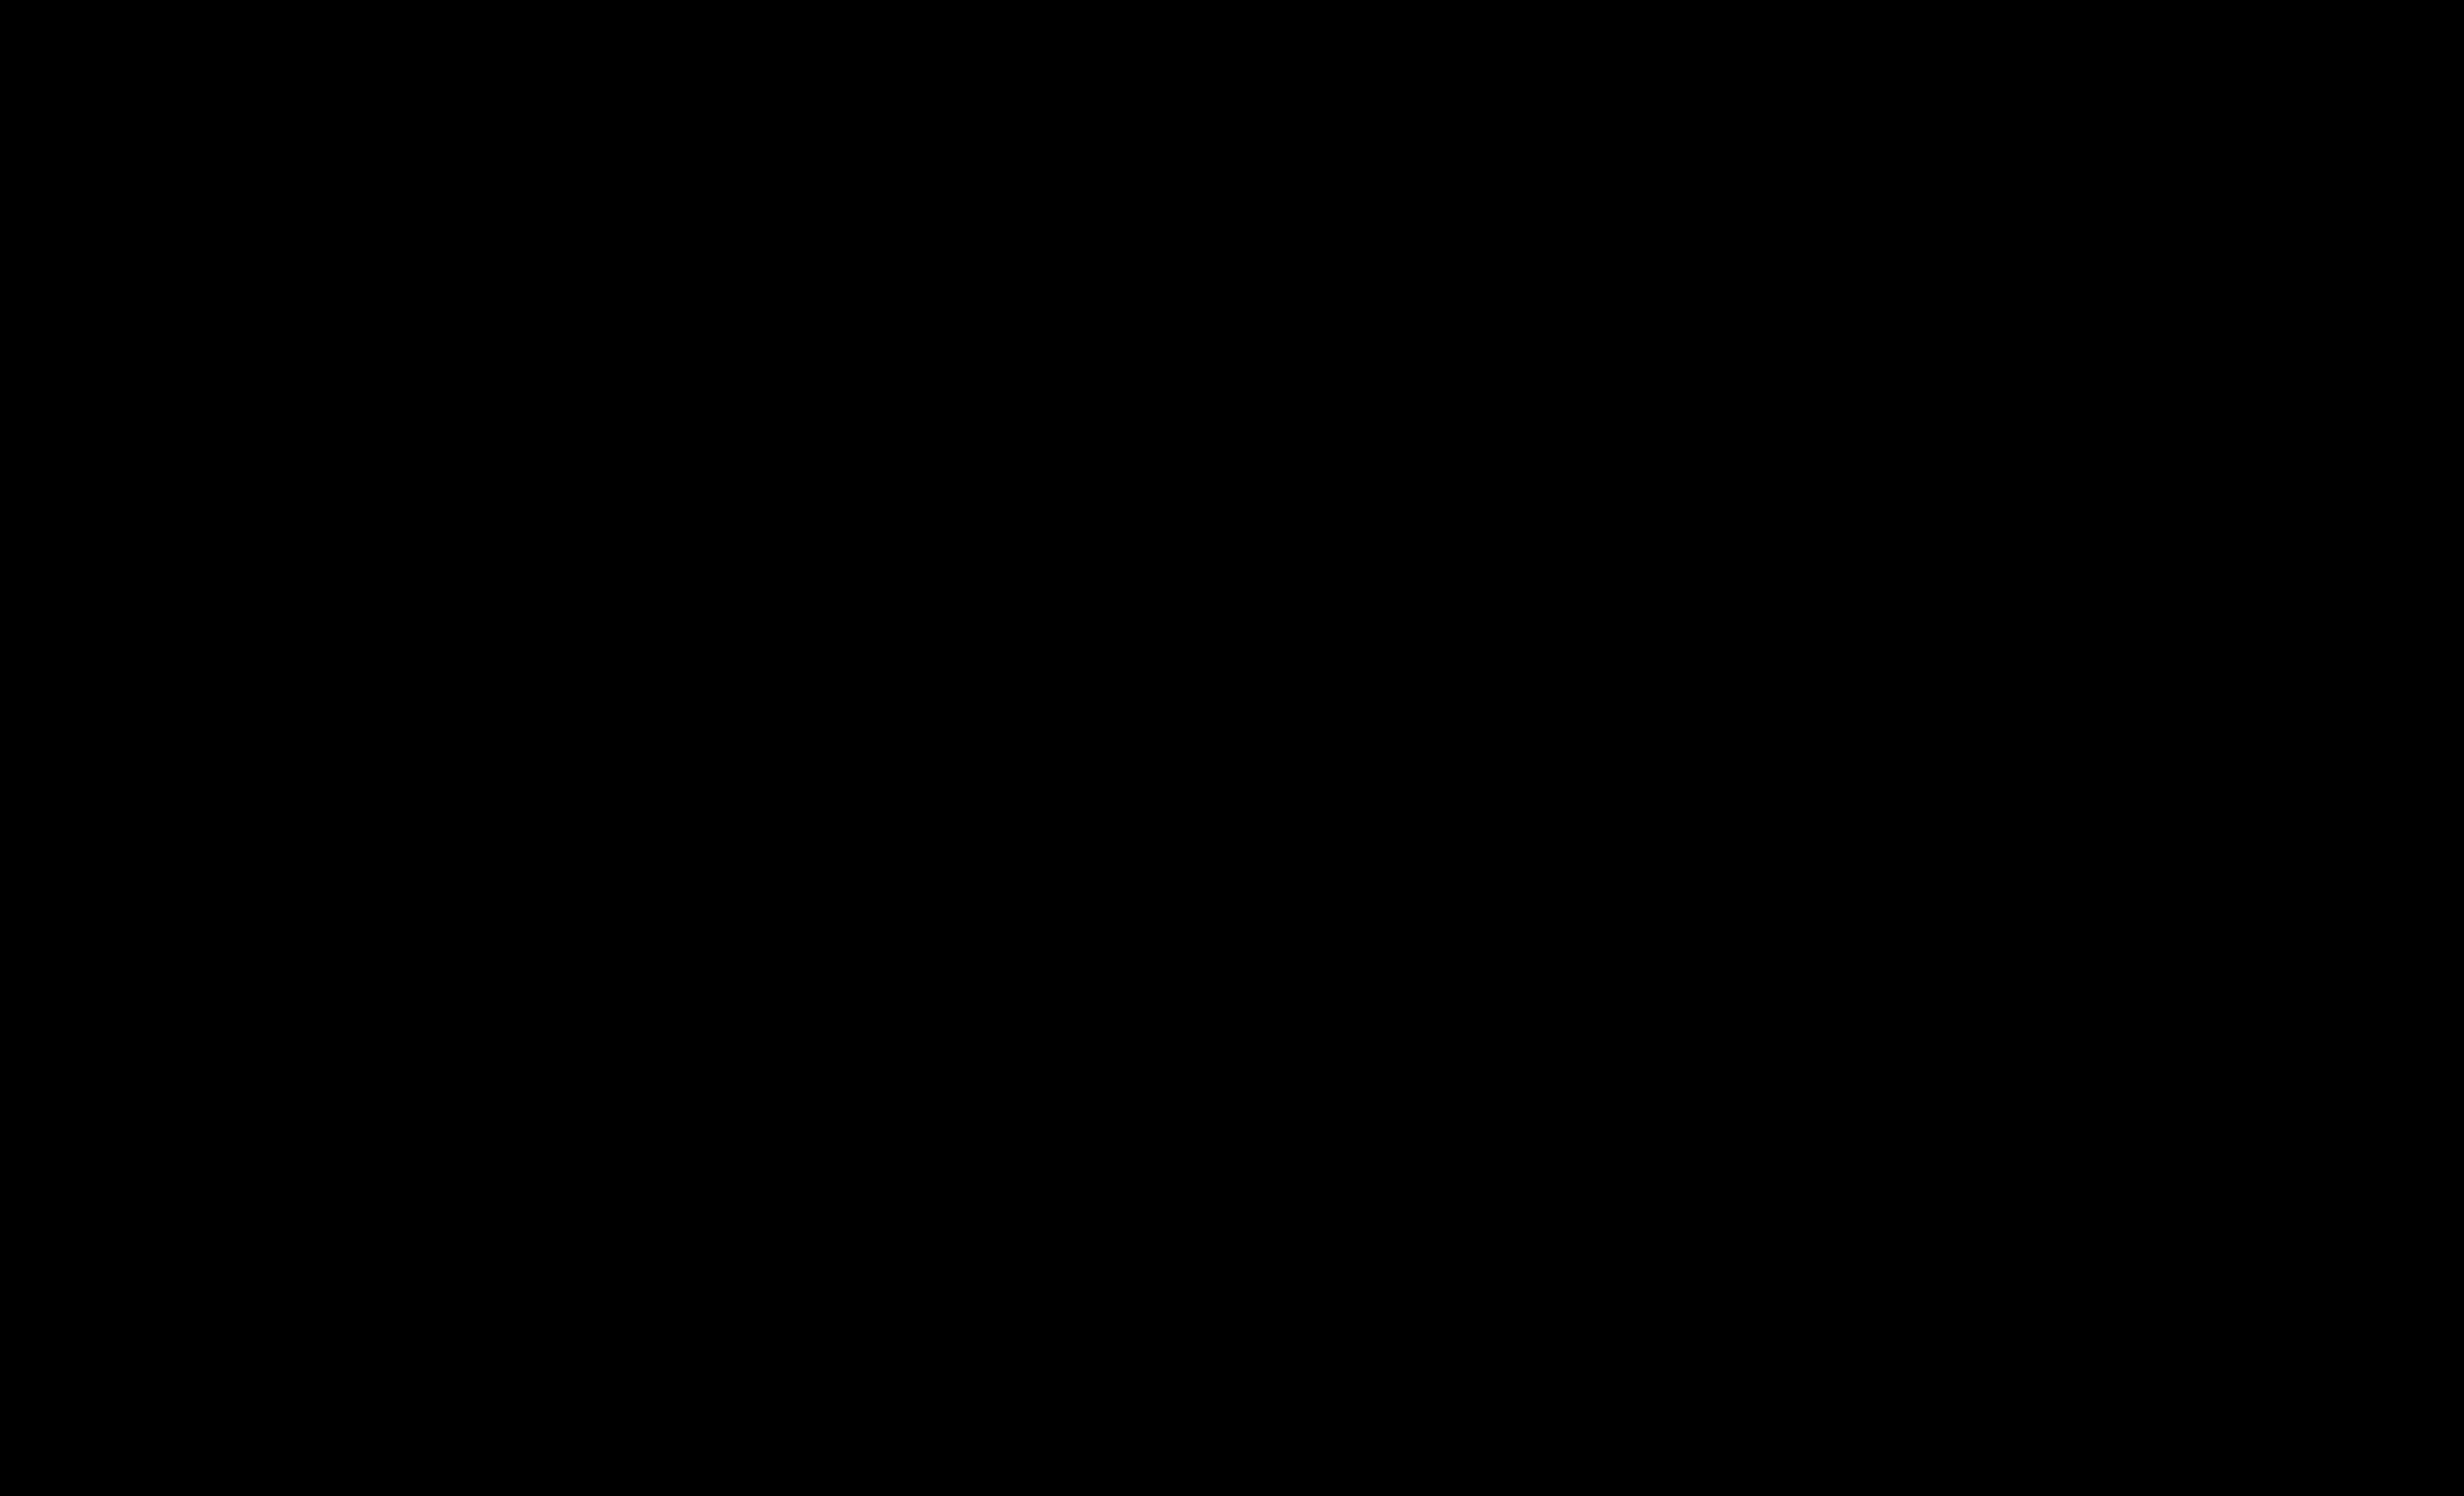 hindi name led design